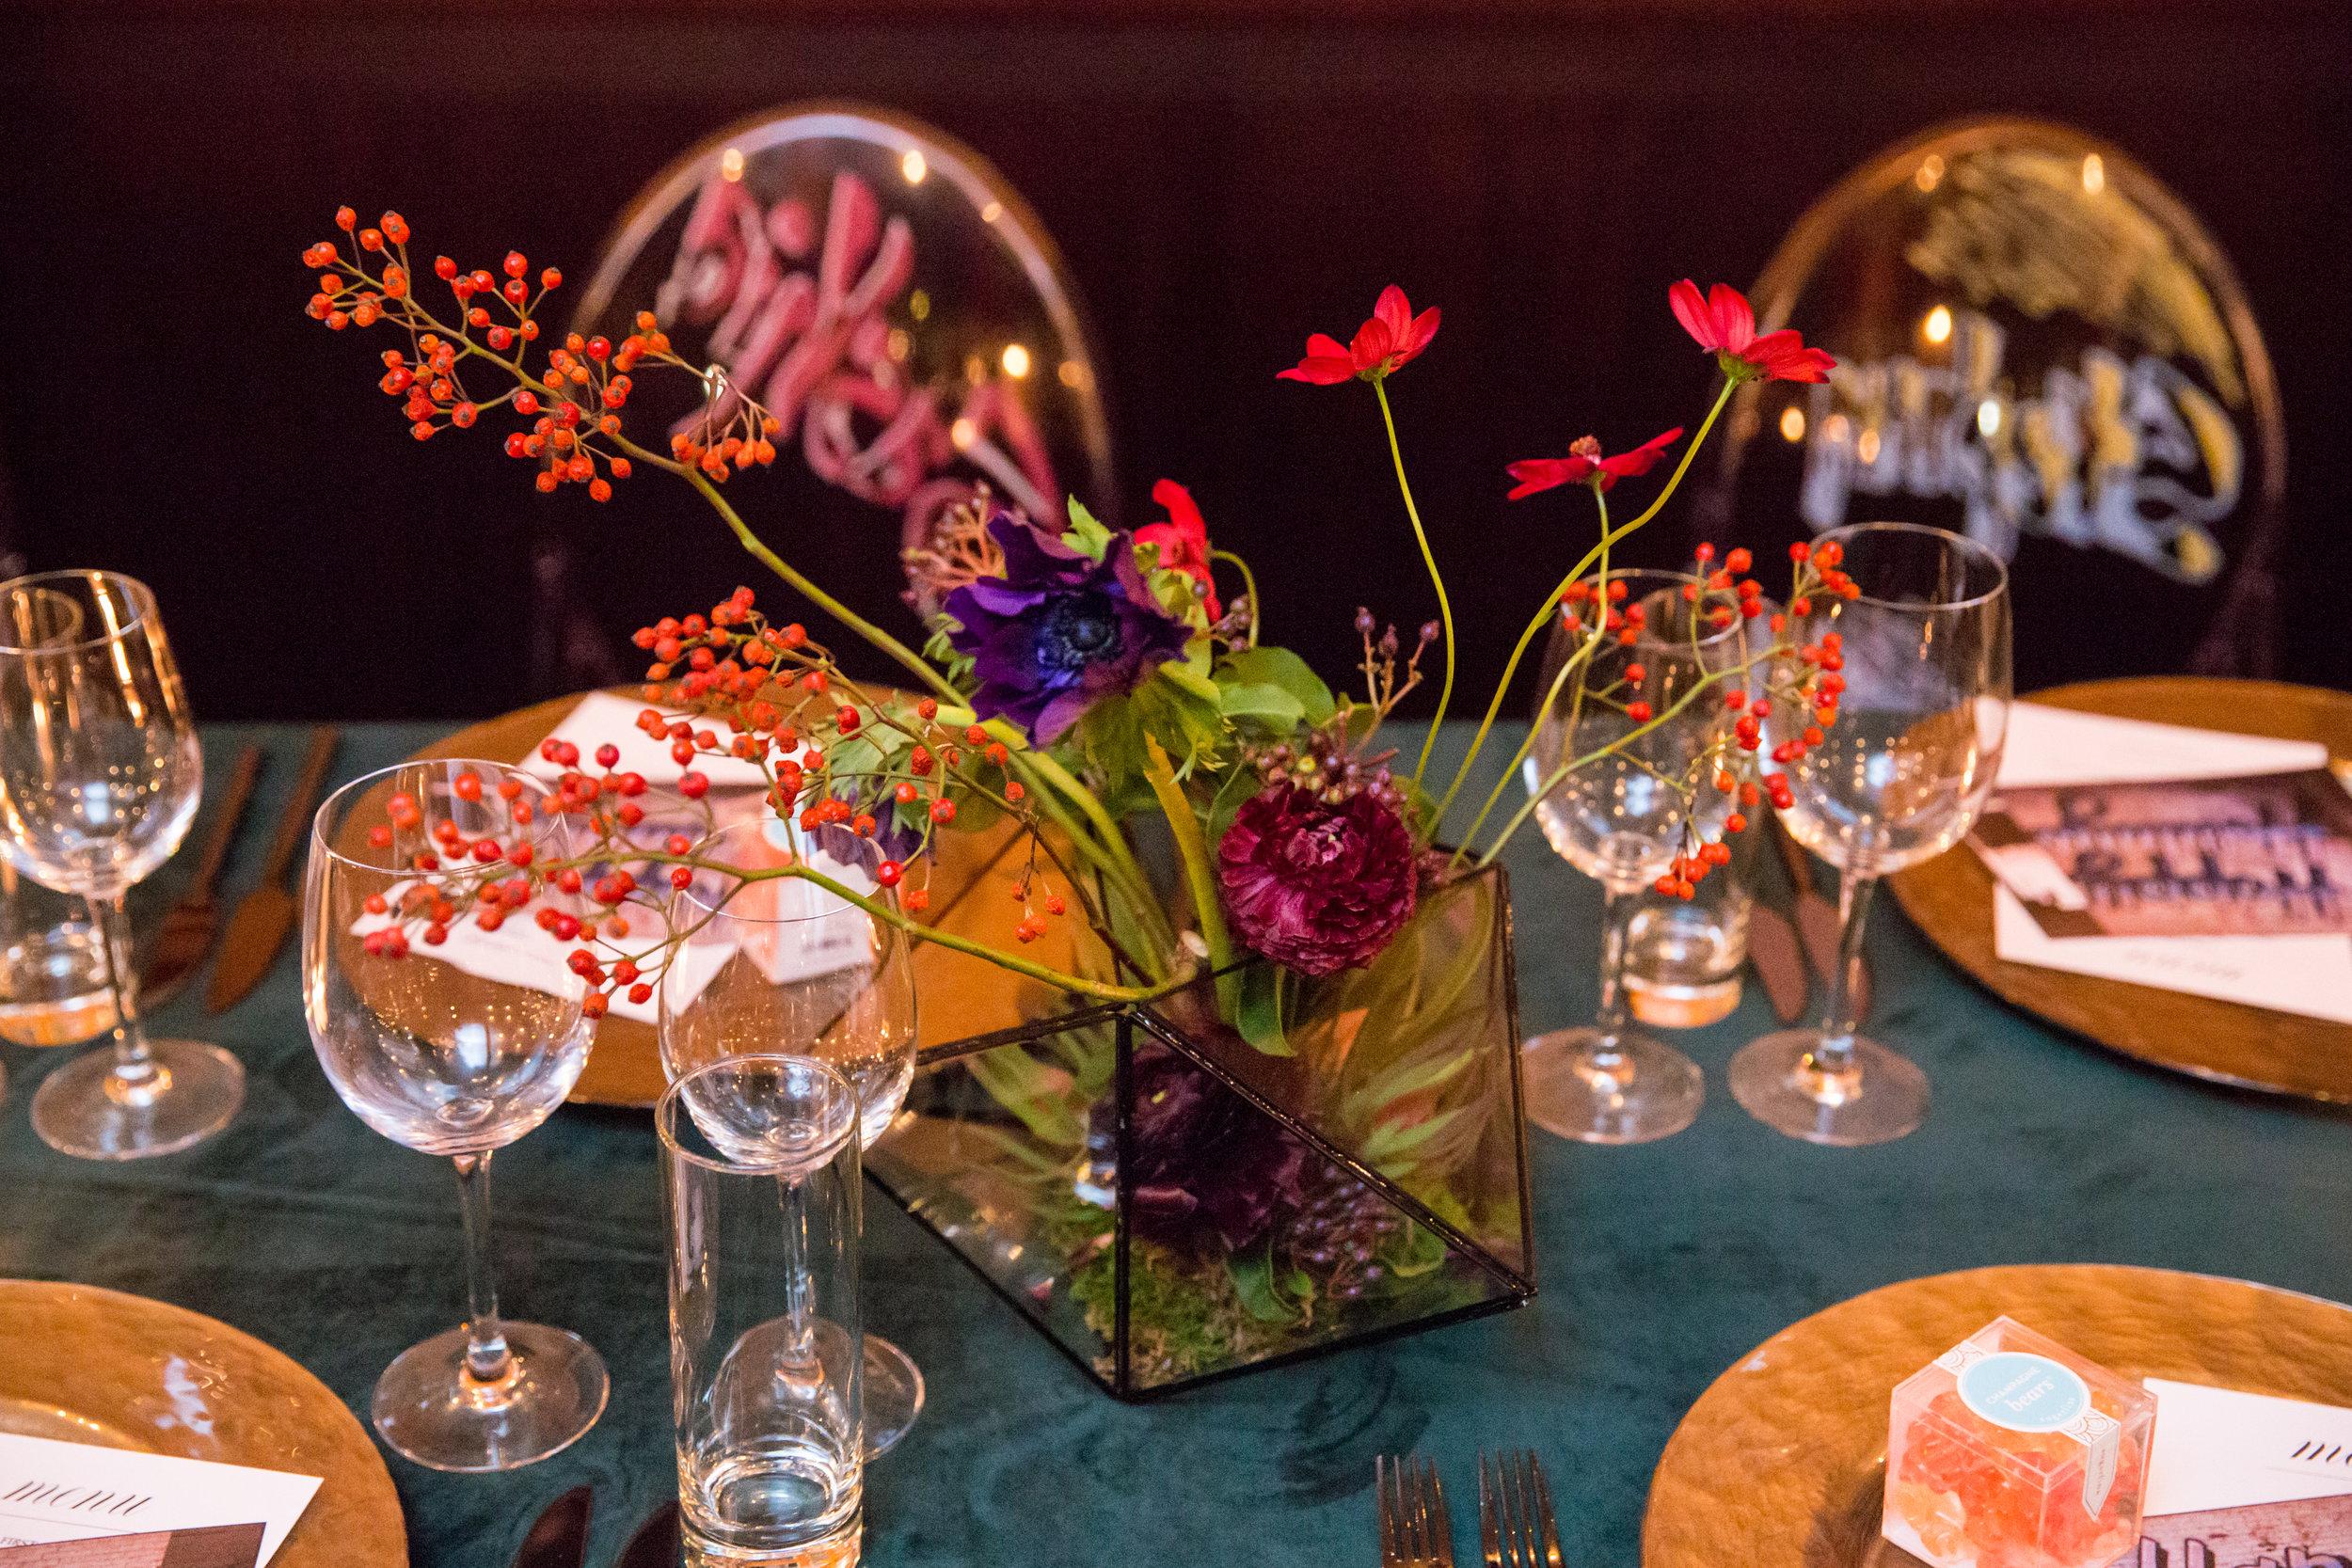 Gramercy-Park-Hotel-Holiday-Party-Andrea-Freeman-Events-5.JPG